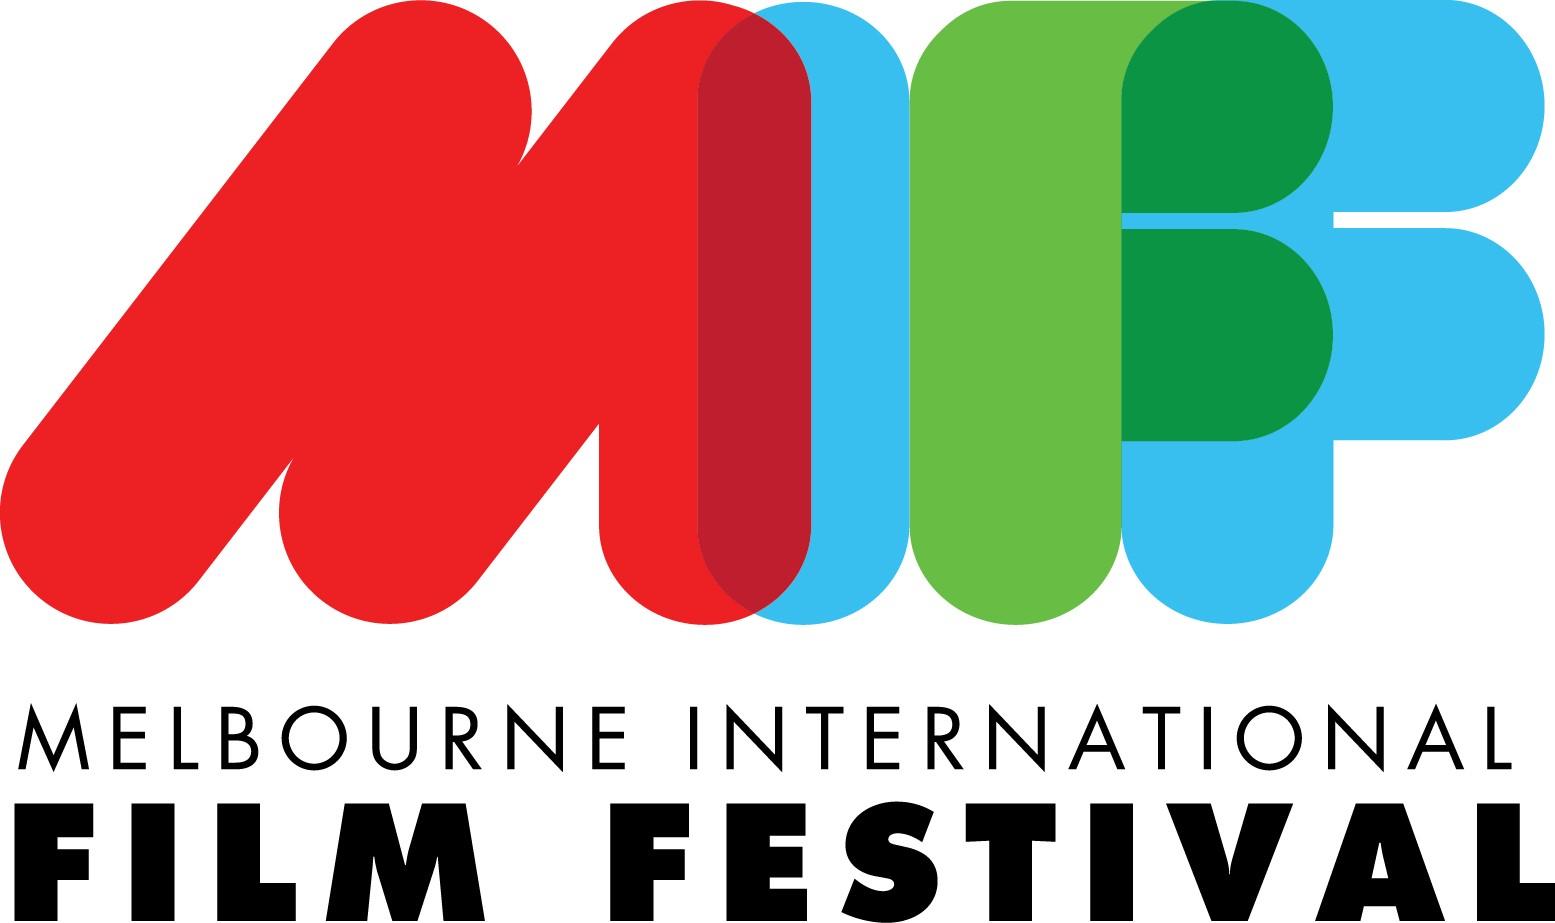 Melbourne International Film Festival - Sofy.tv - Blog